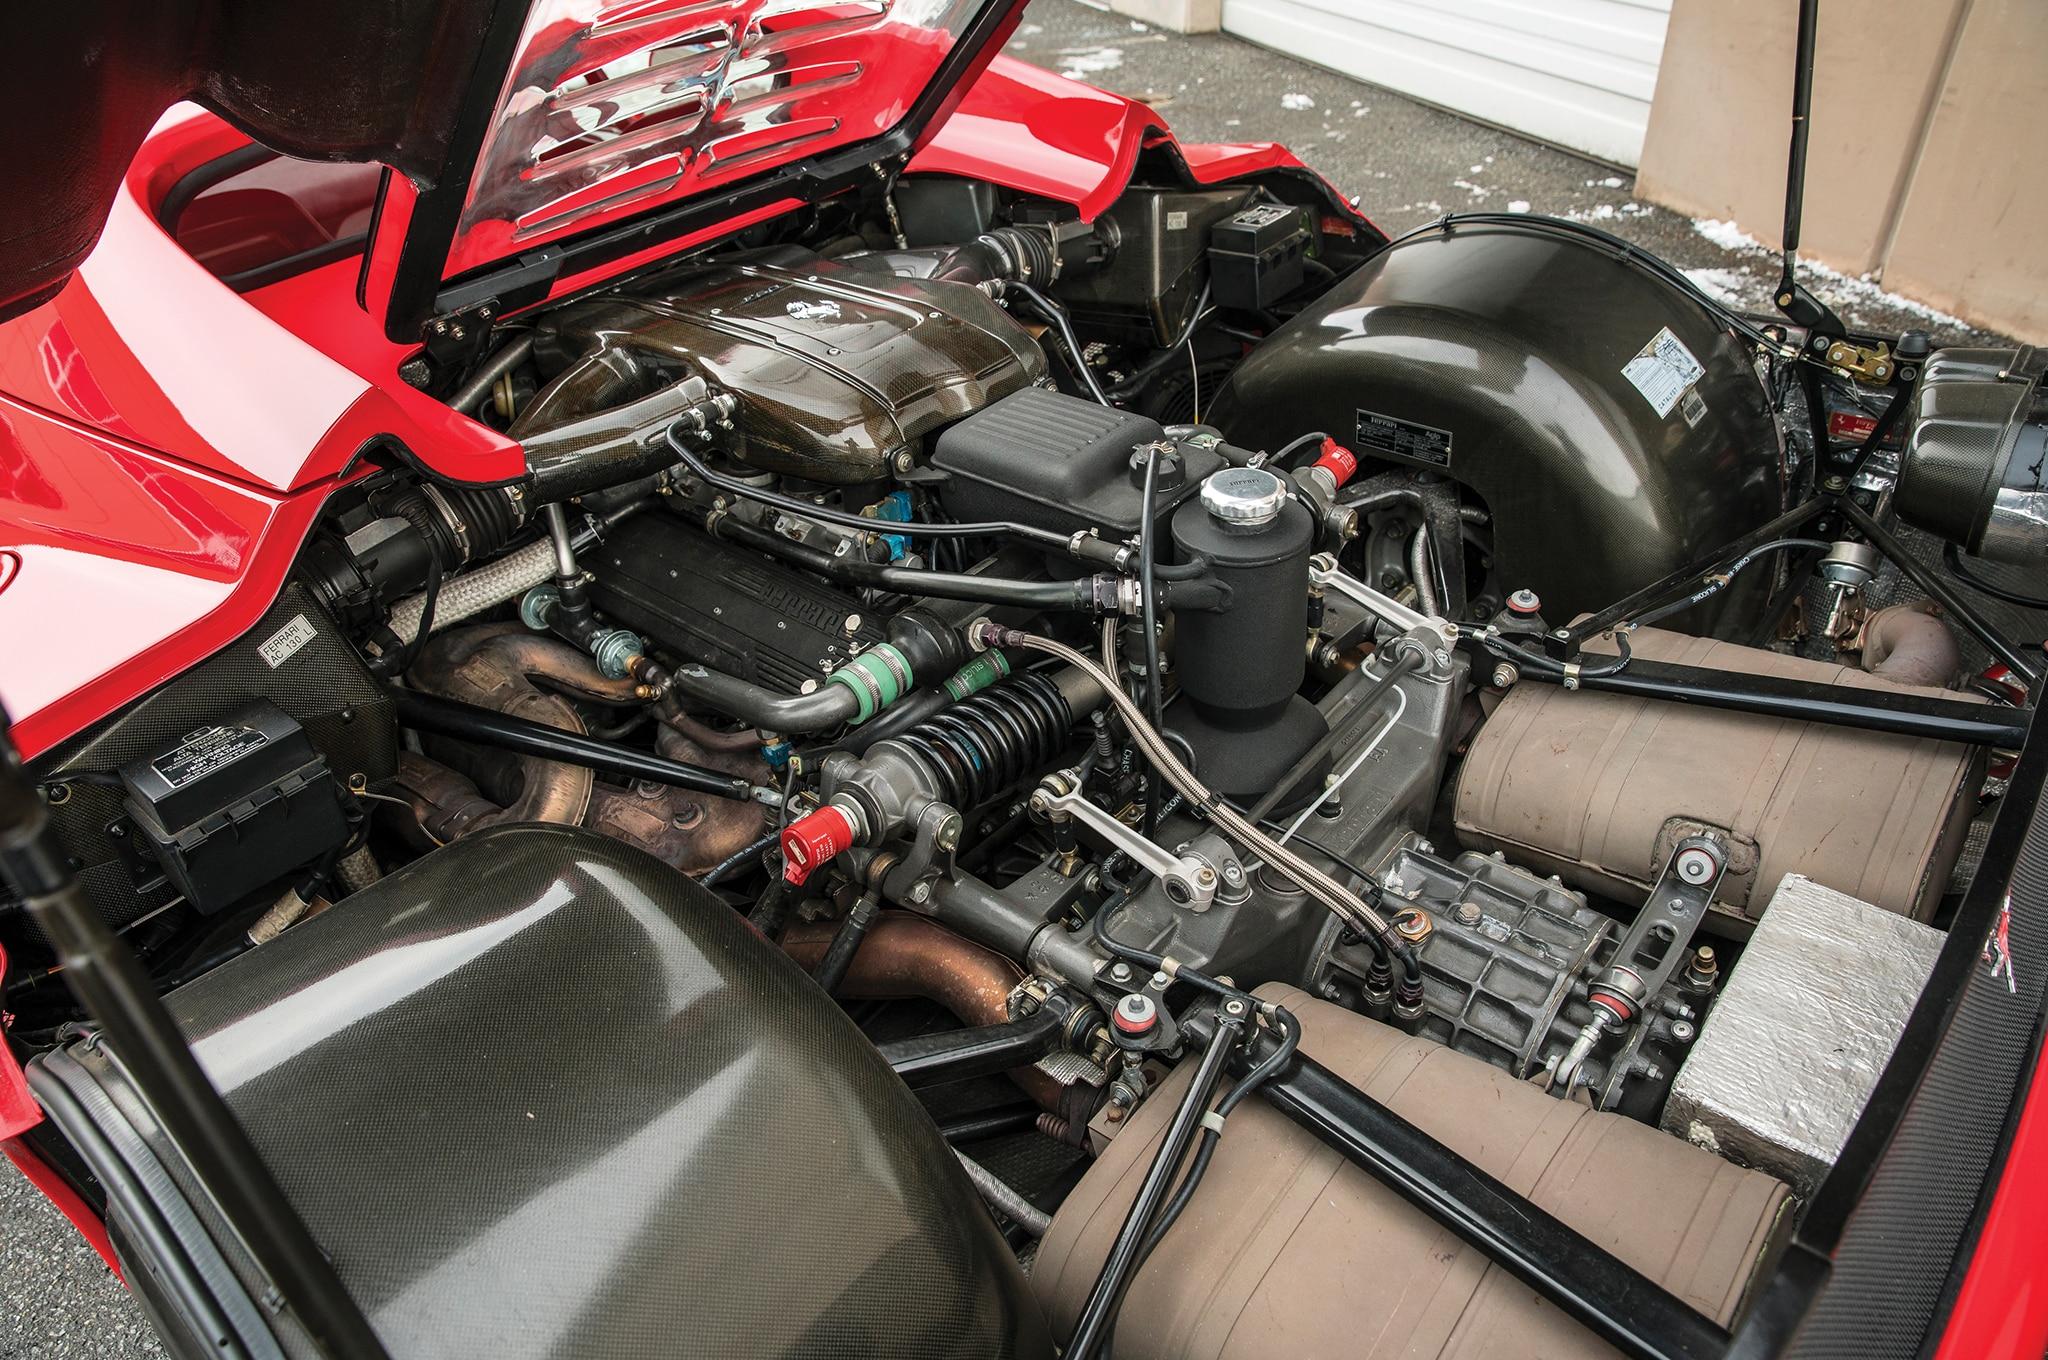 Just Listed: Mike Tyson's 1995 Ferrari F50 | Automobile ...